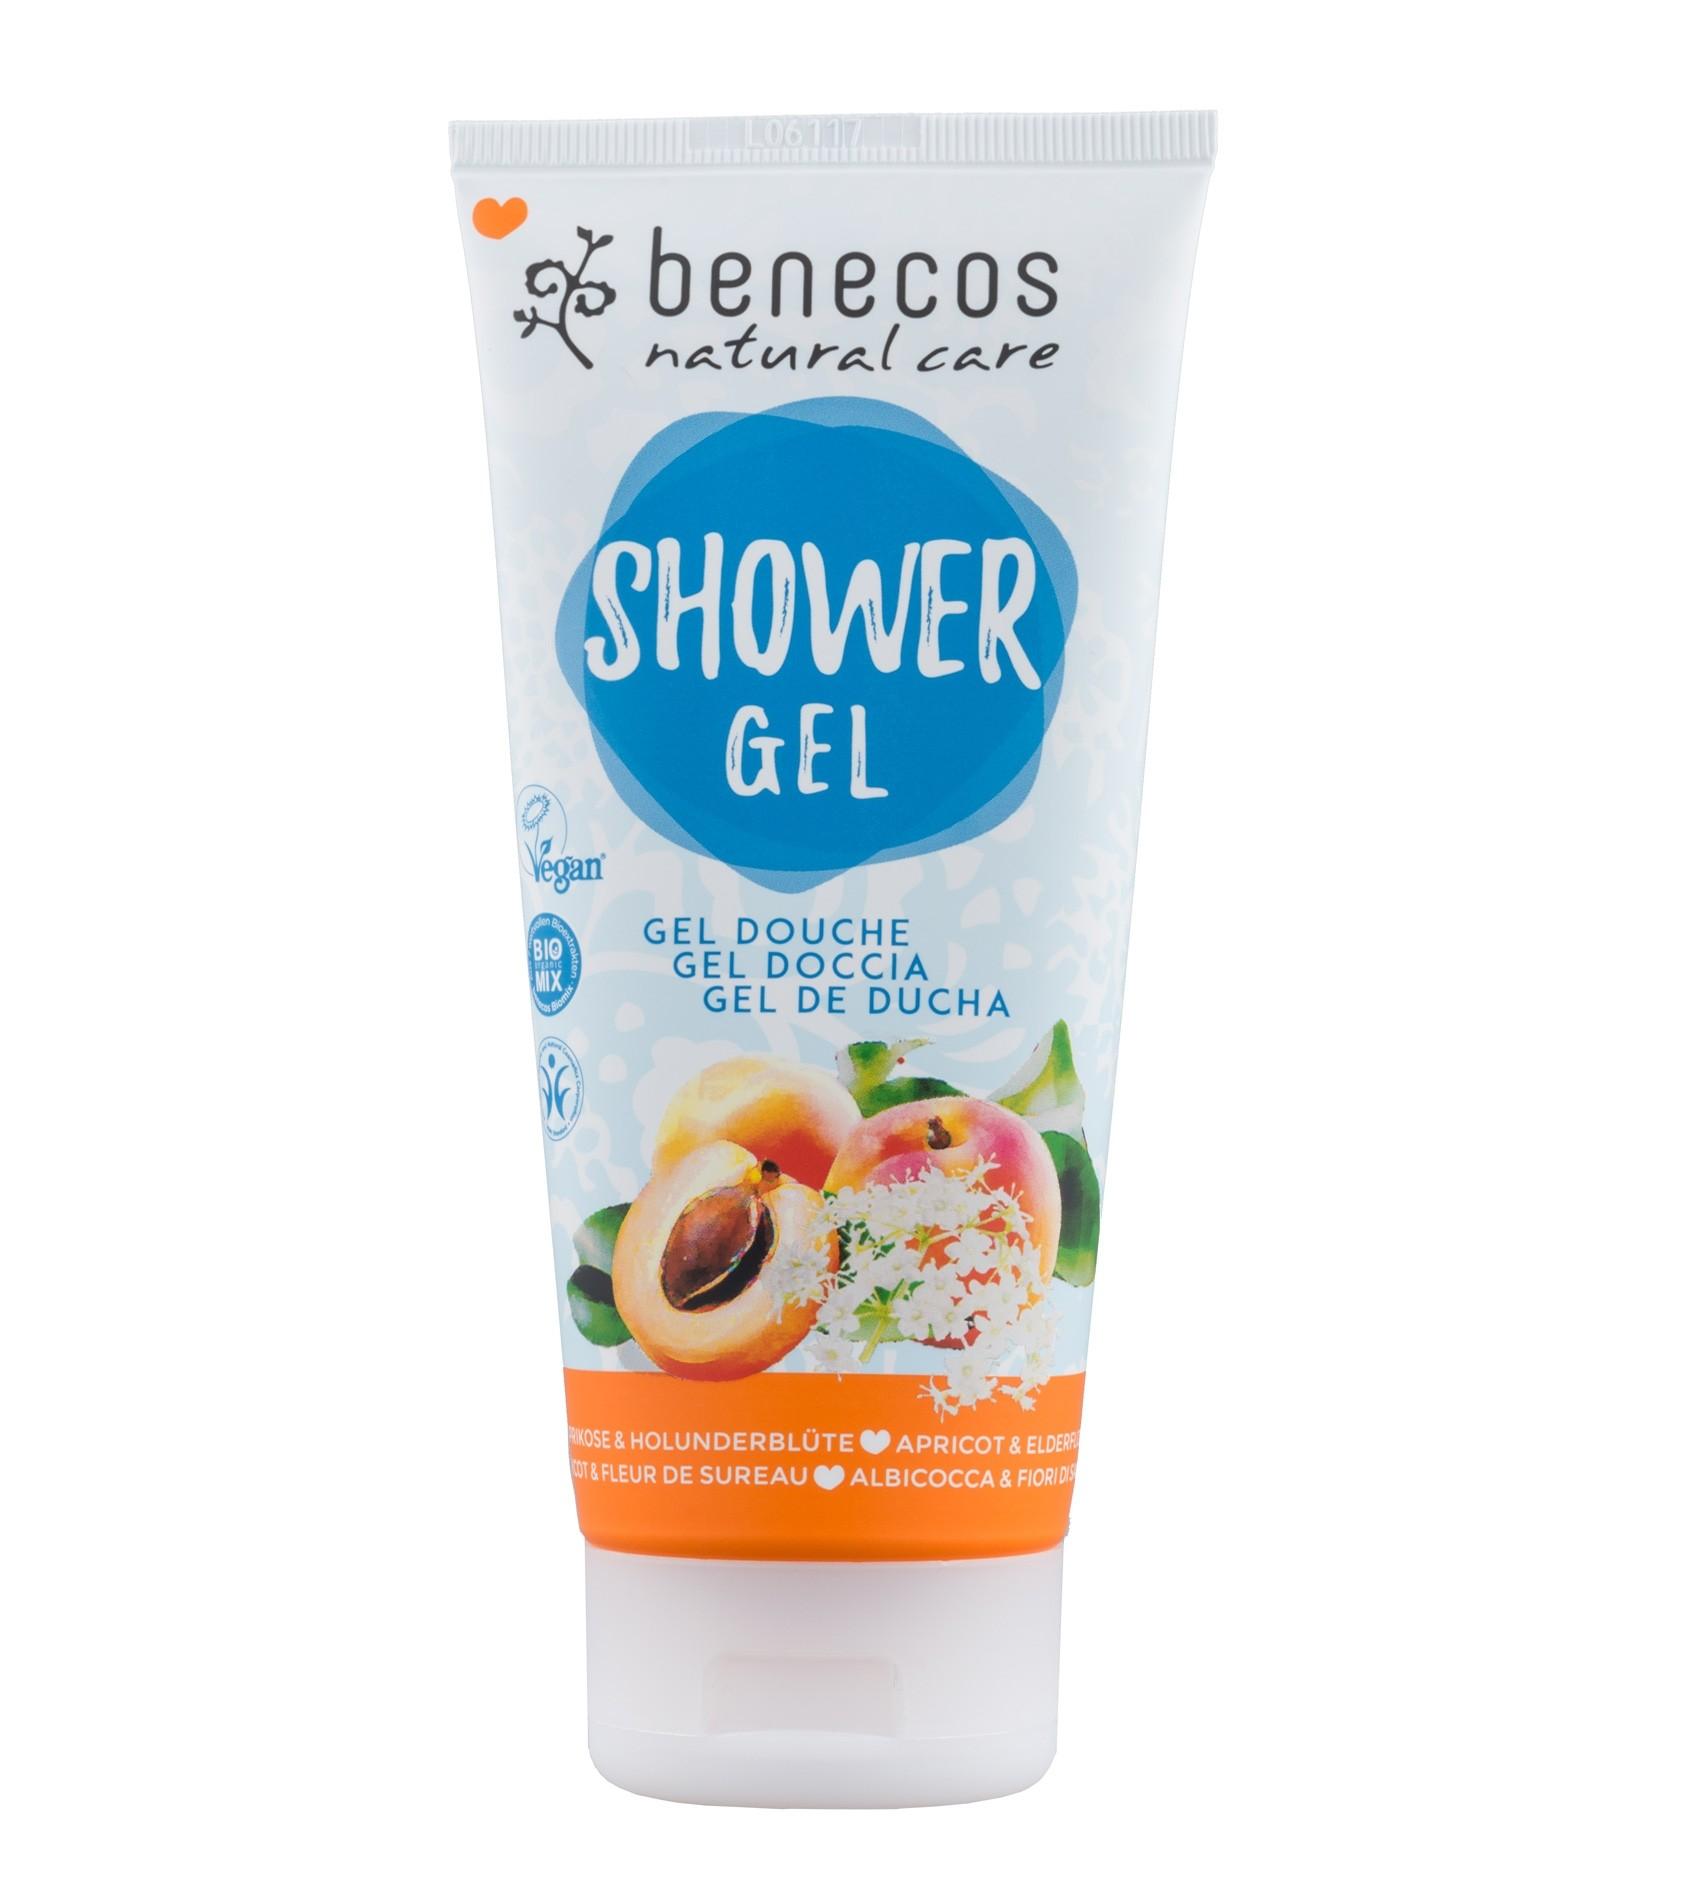 Benecos Vegan Apricot & Elderflower Shower Gel